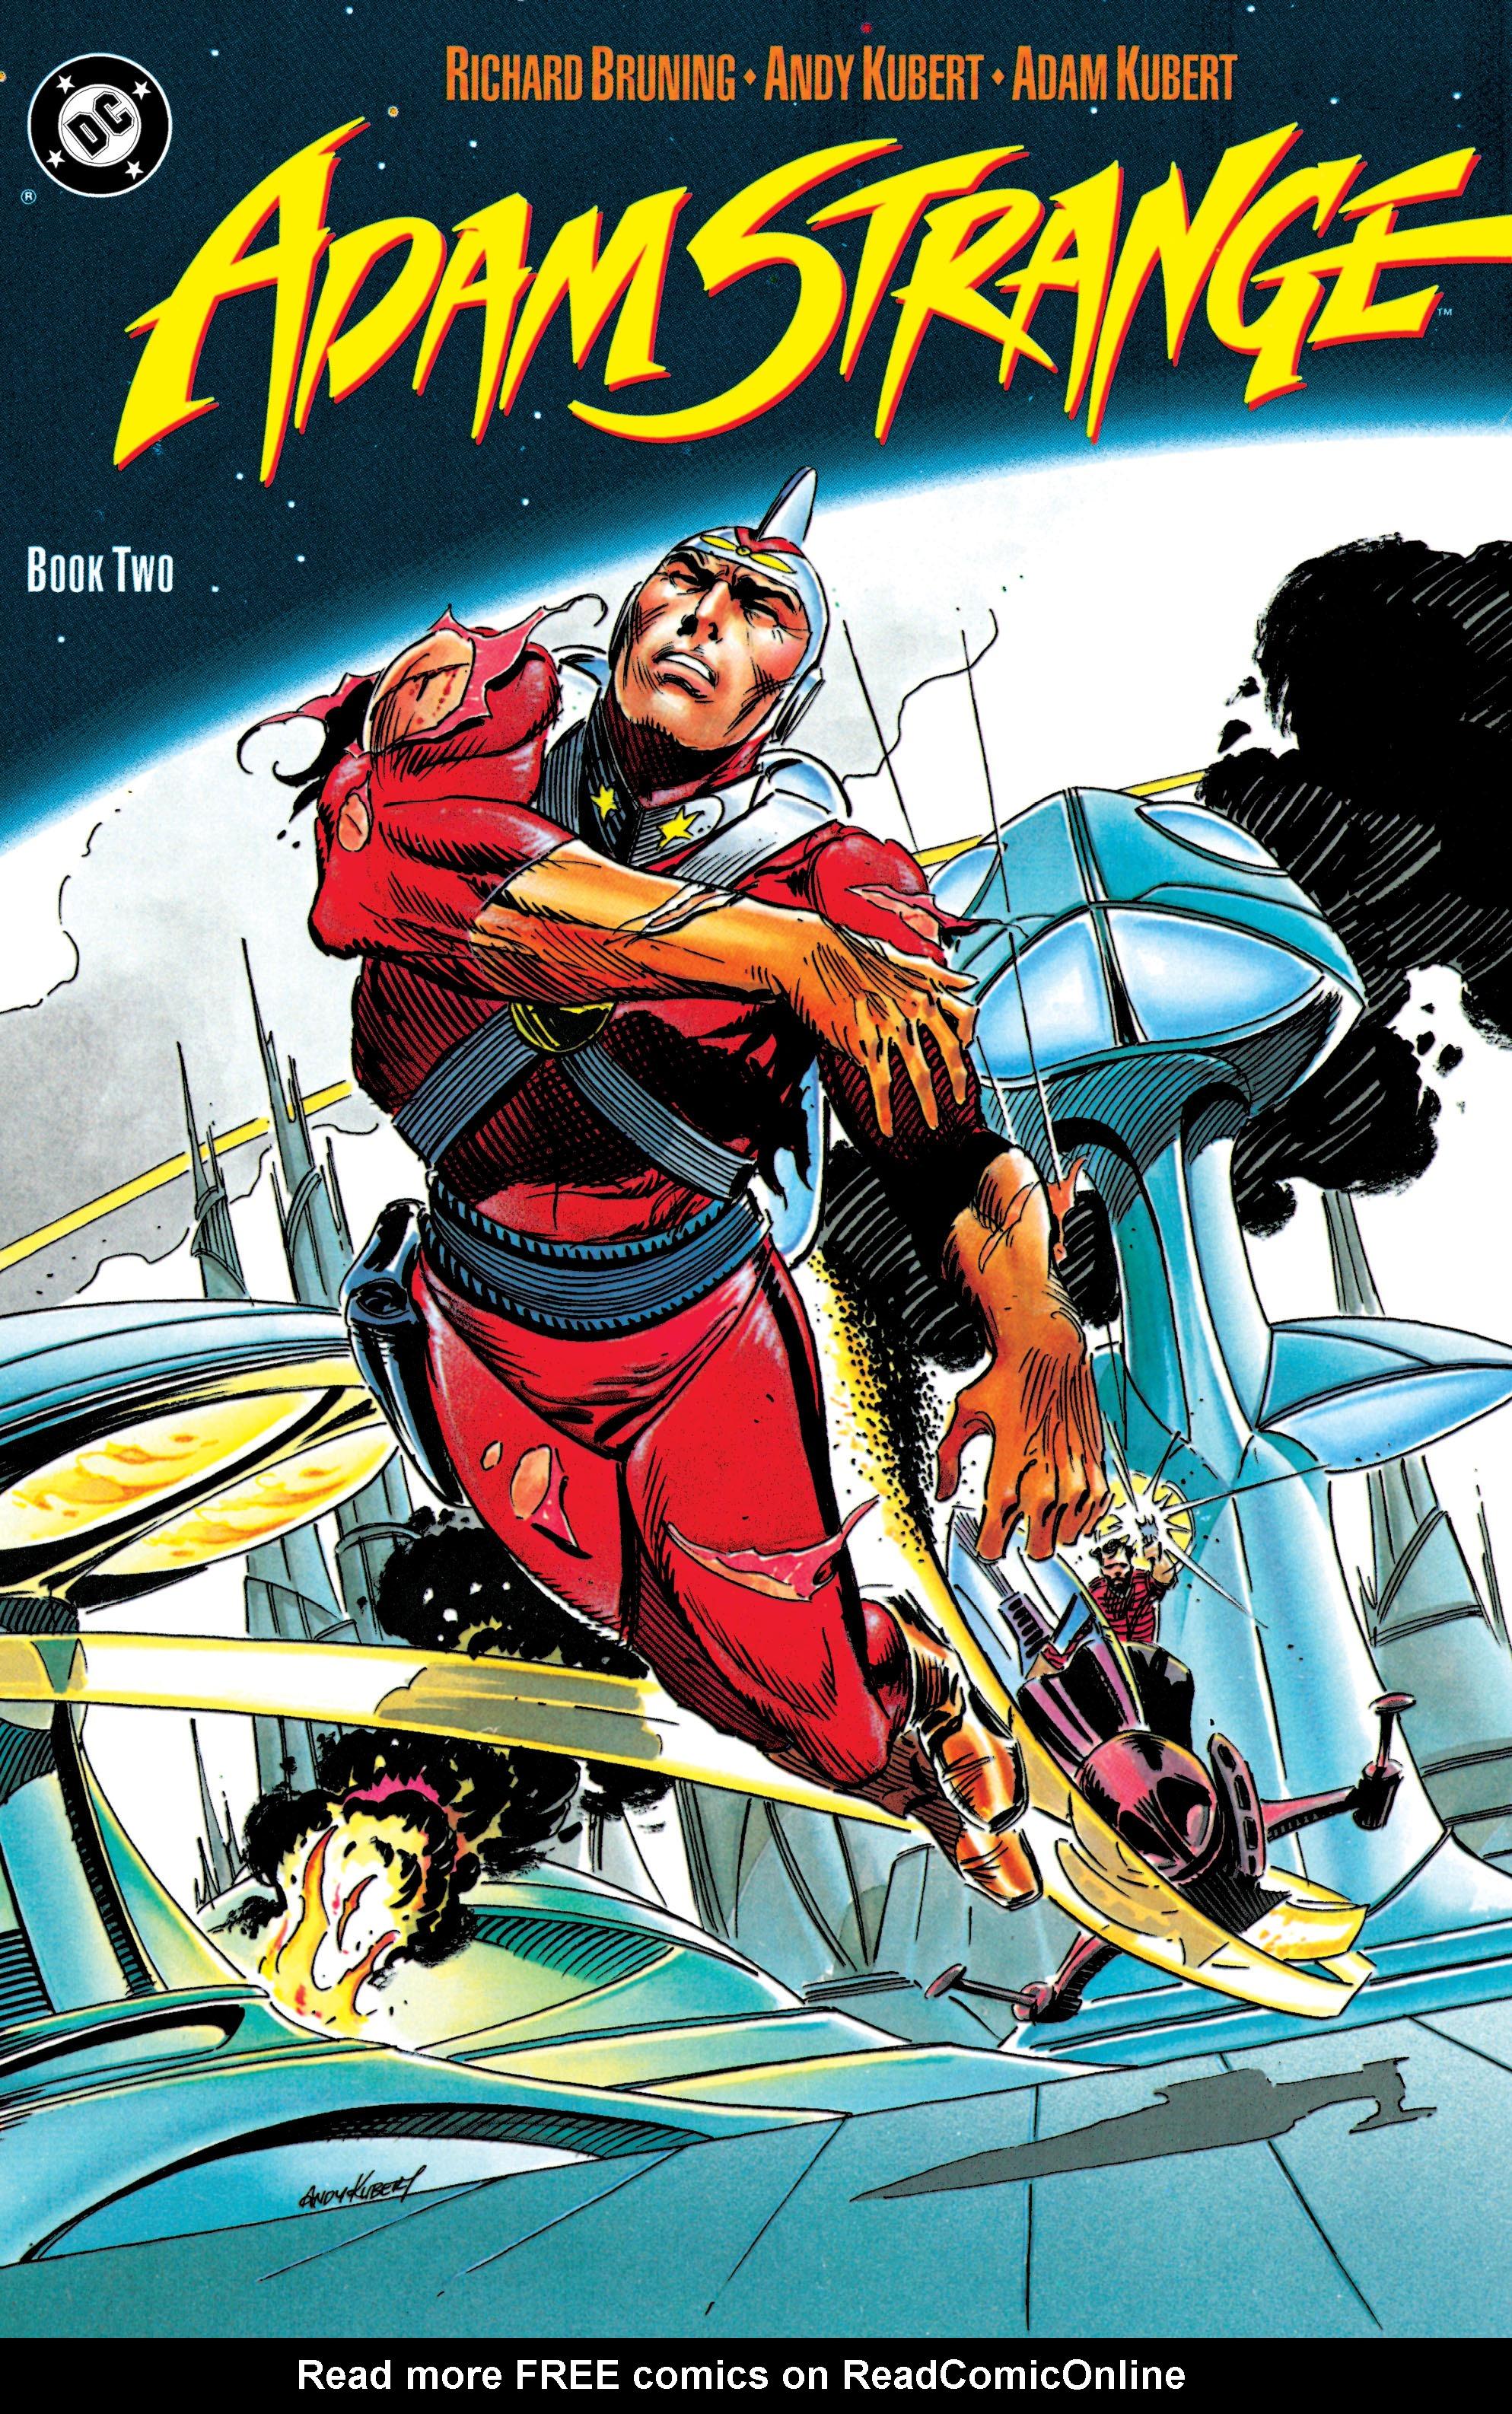 Read online Adam Strange (1990) comic -  Issue #2 - 1